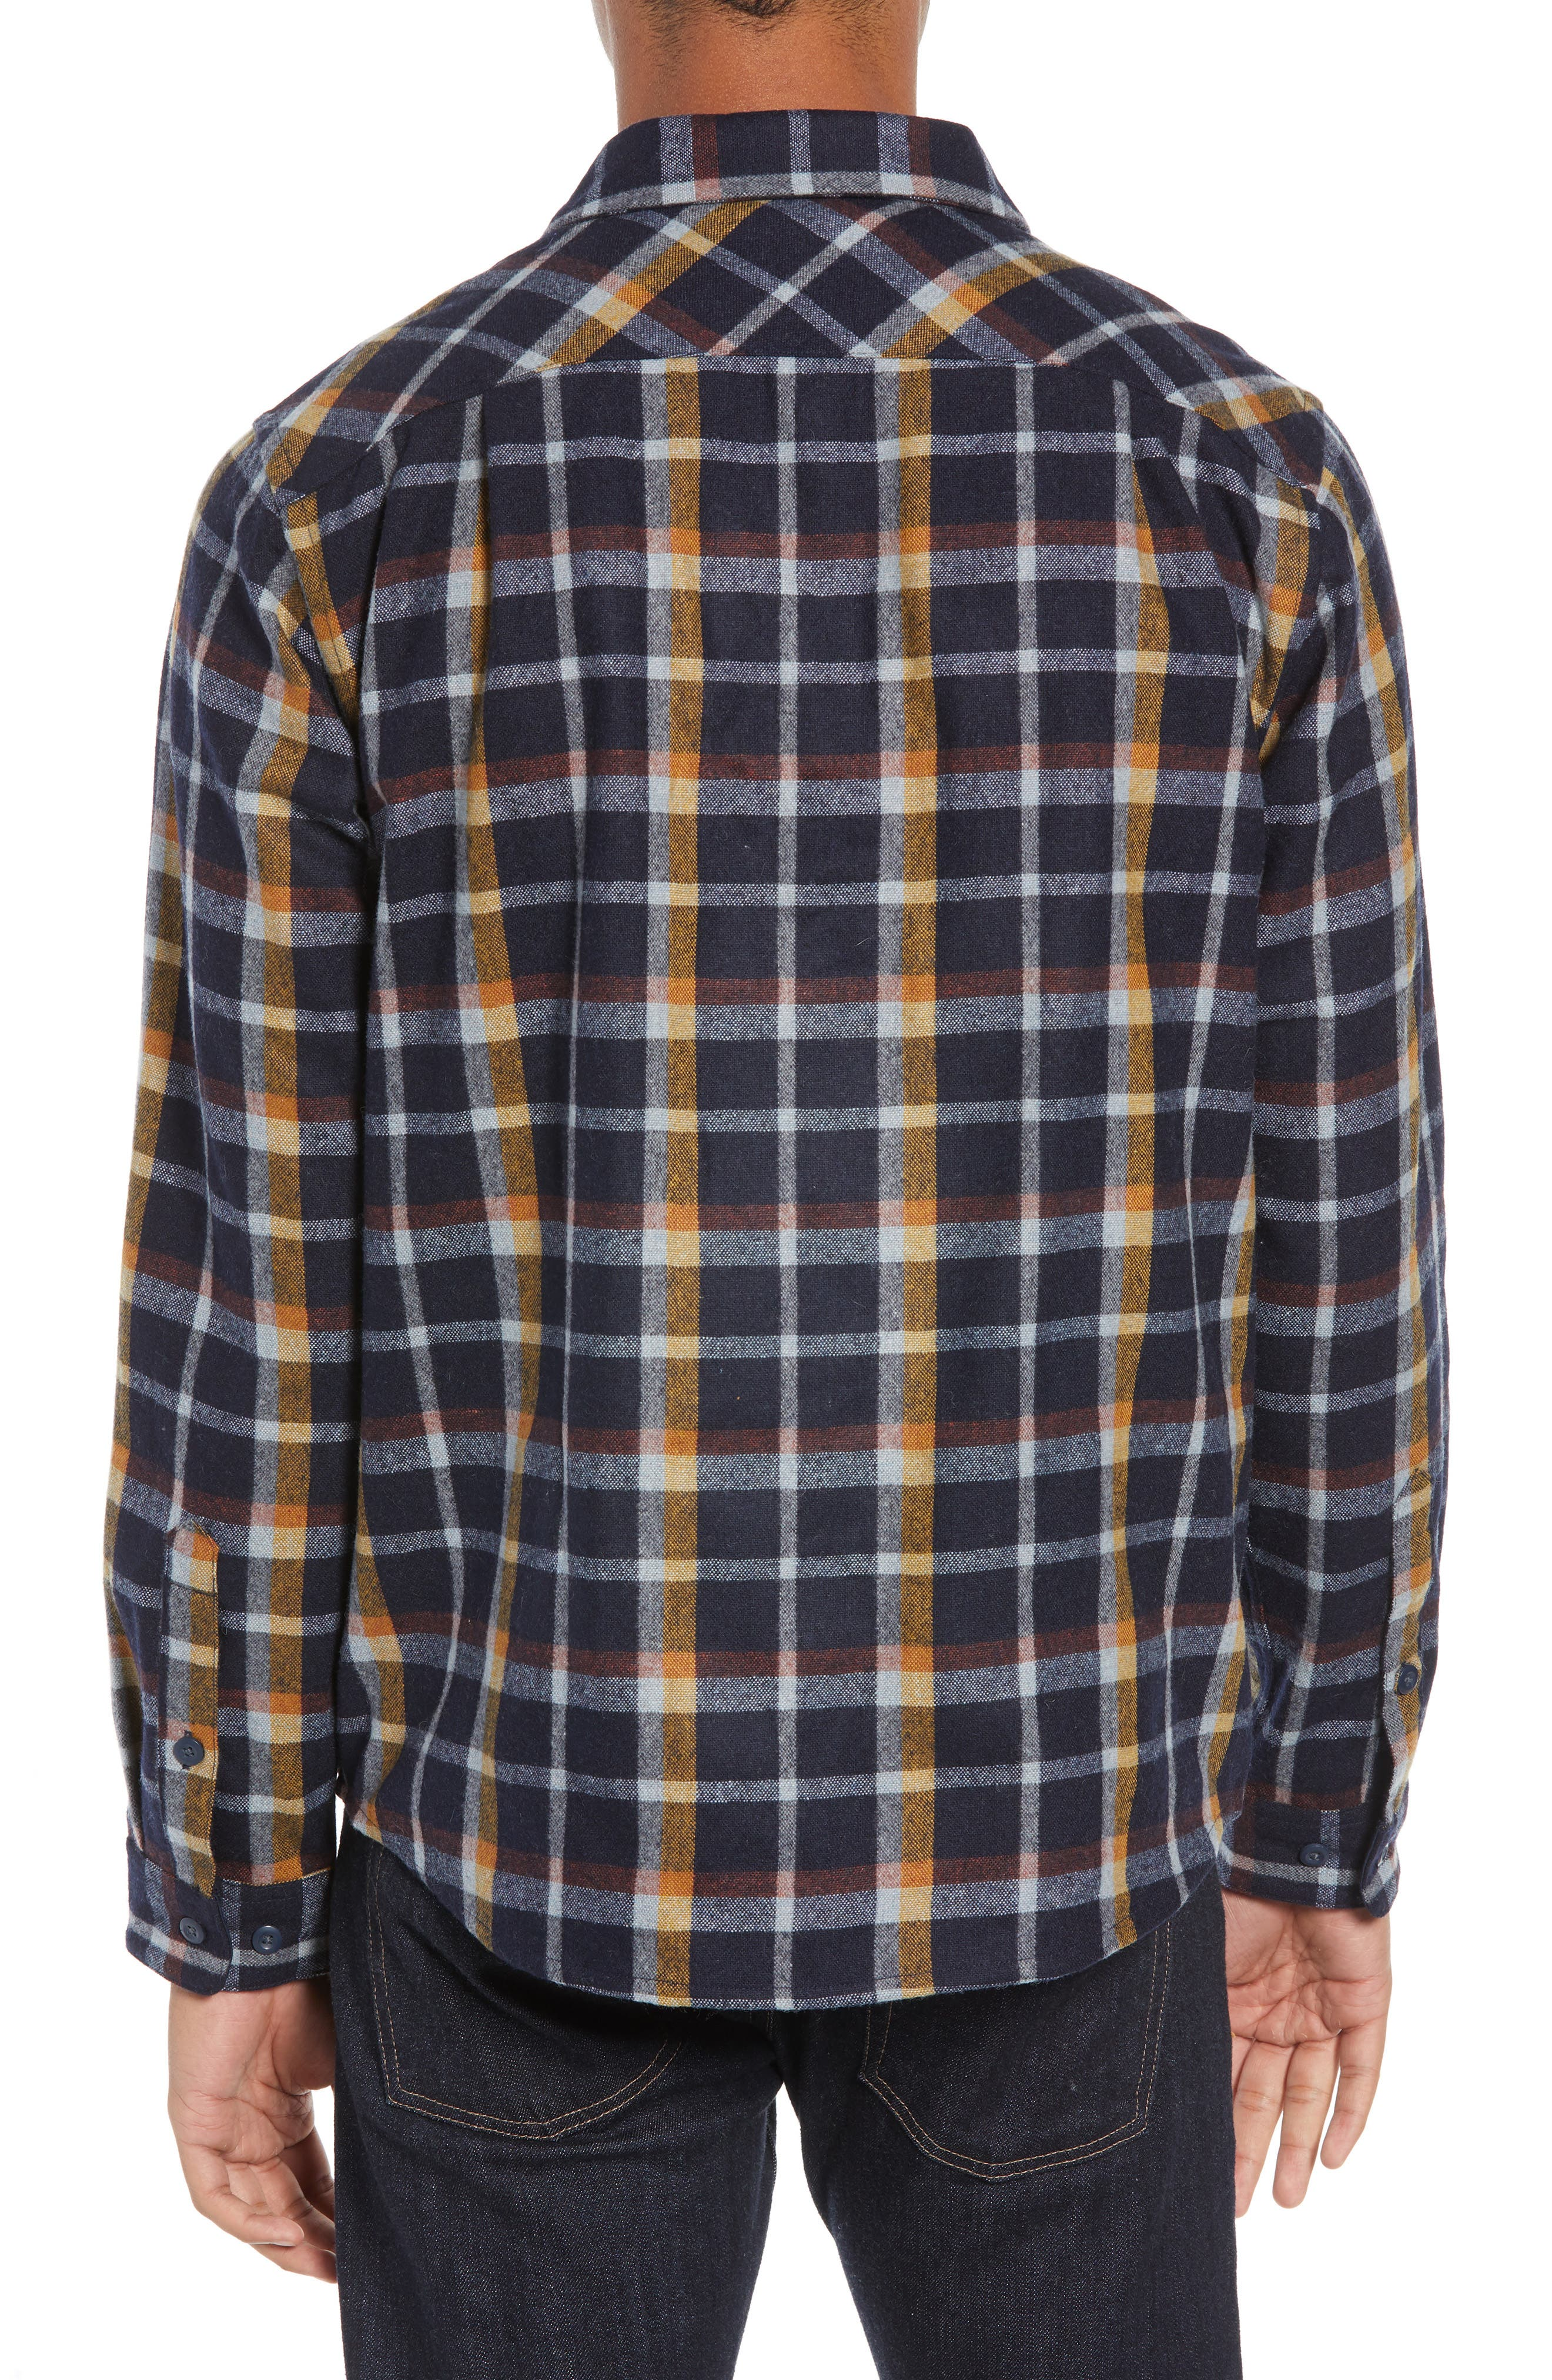 Recycled Wool Blend Shirt,                             Alternate thumbnail 3, color,                             REBEL PLAID/ NAVY BLUE